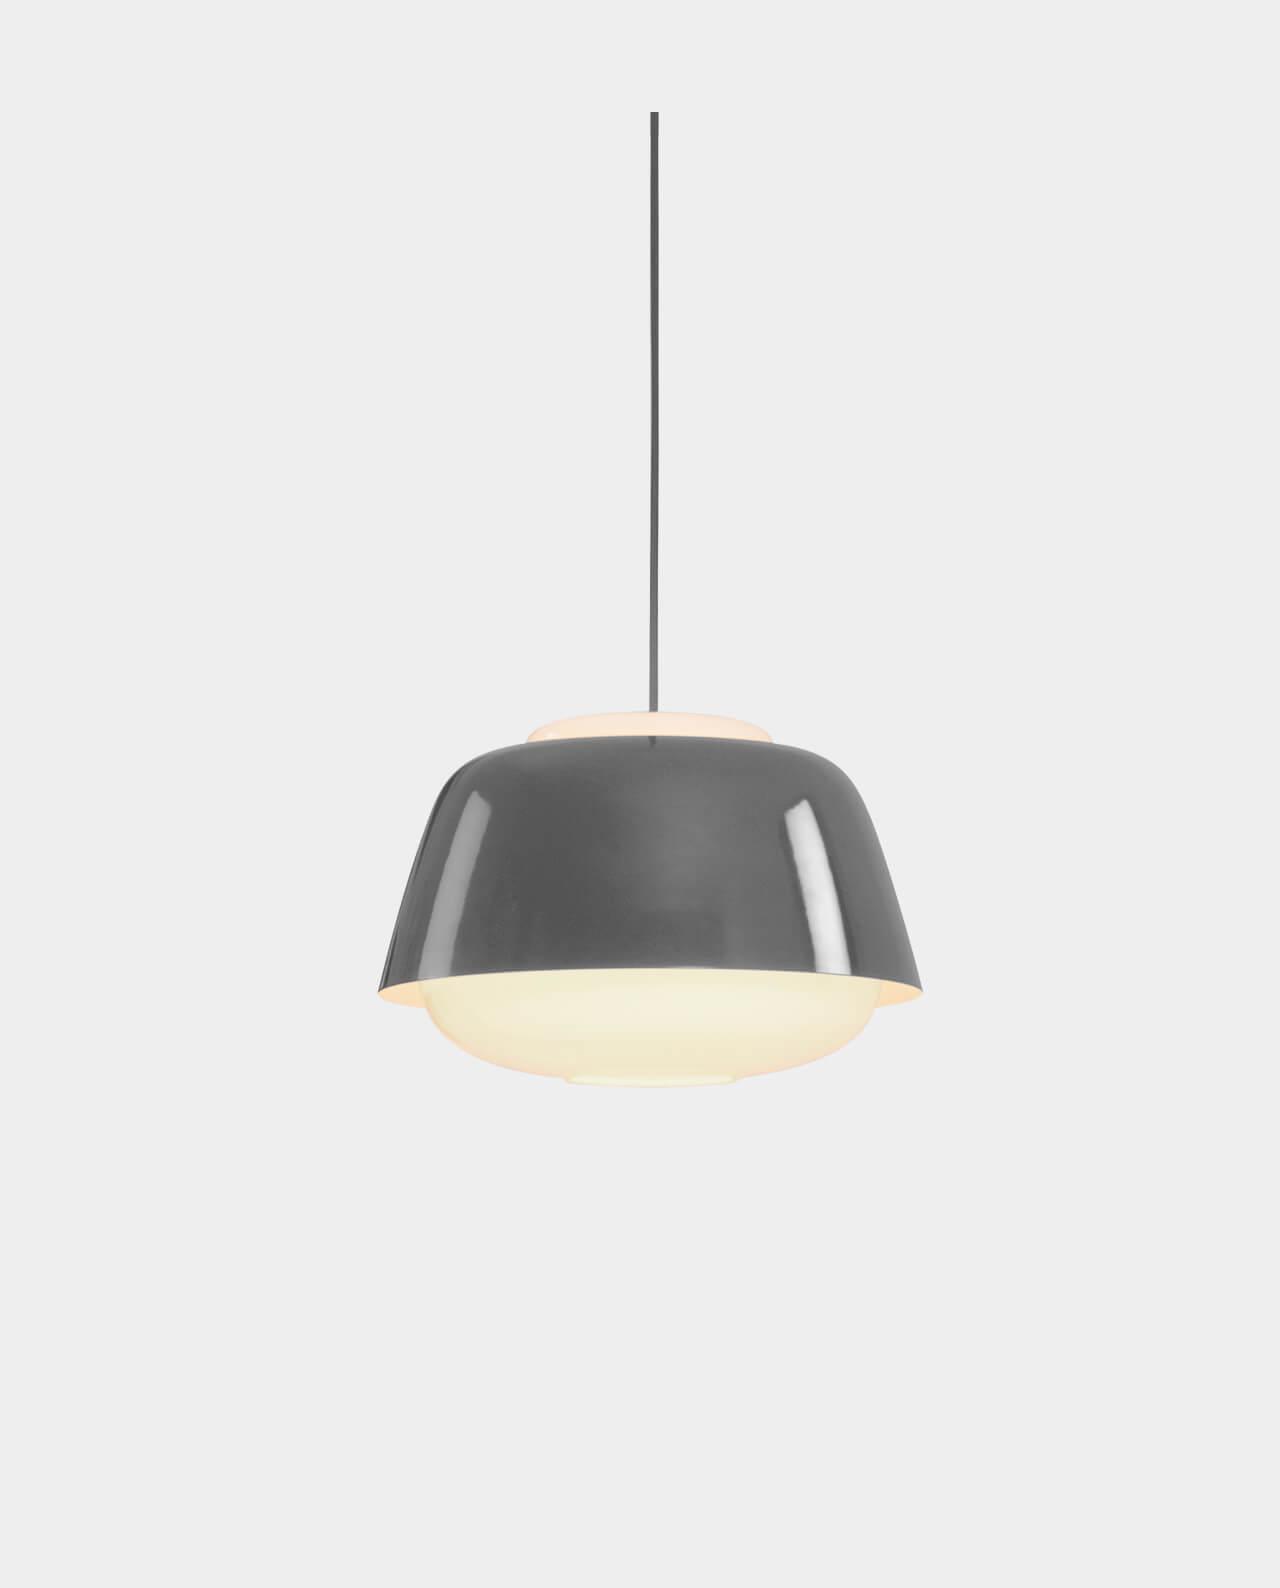 h ngeleuchte design yoko jetzt online kaufen. Black Bedroom Furniture Sets. Home Design Ideas